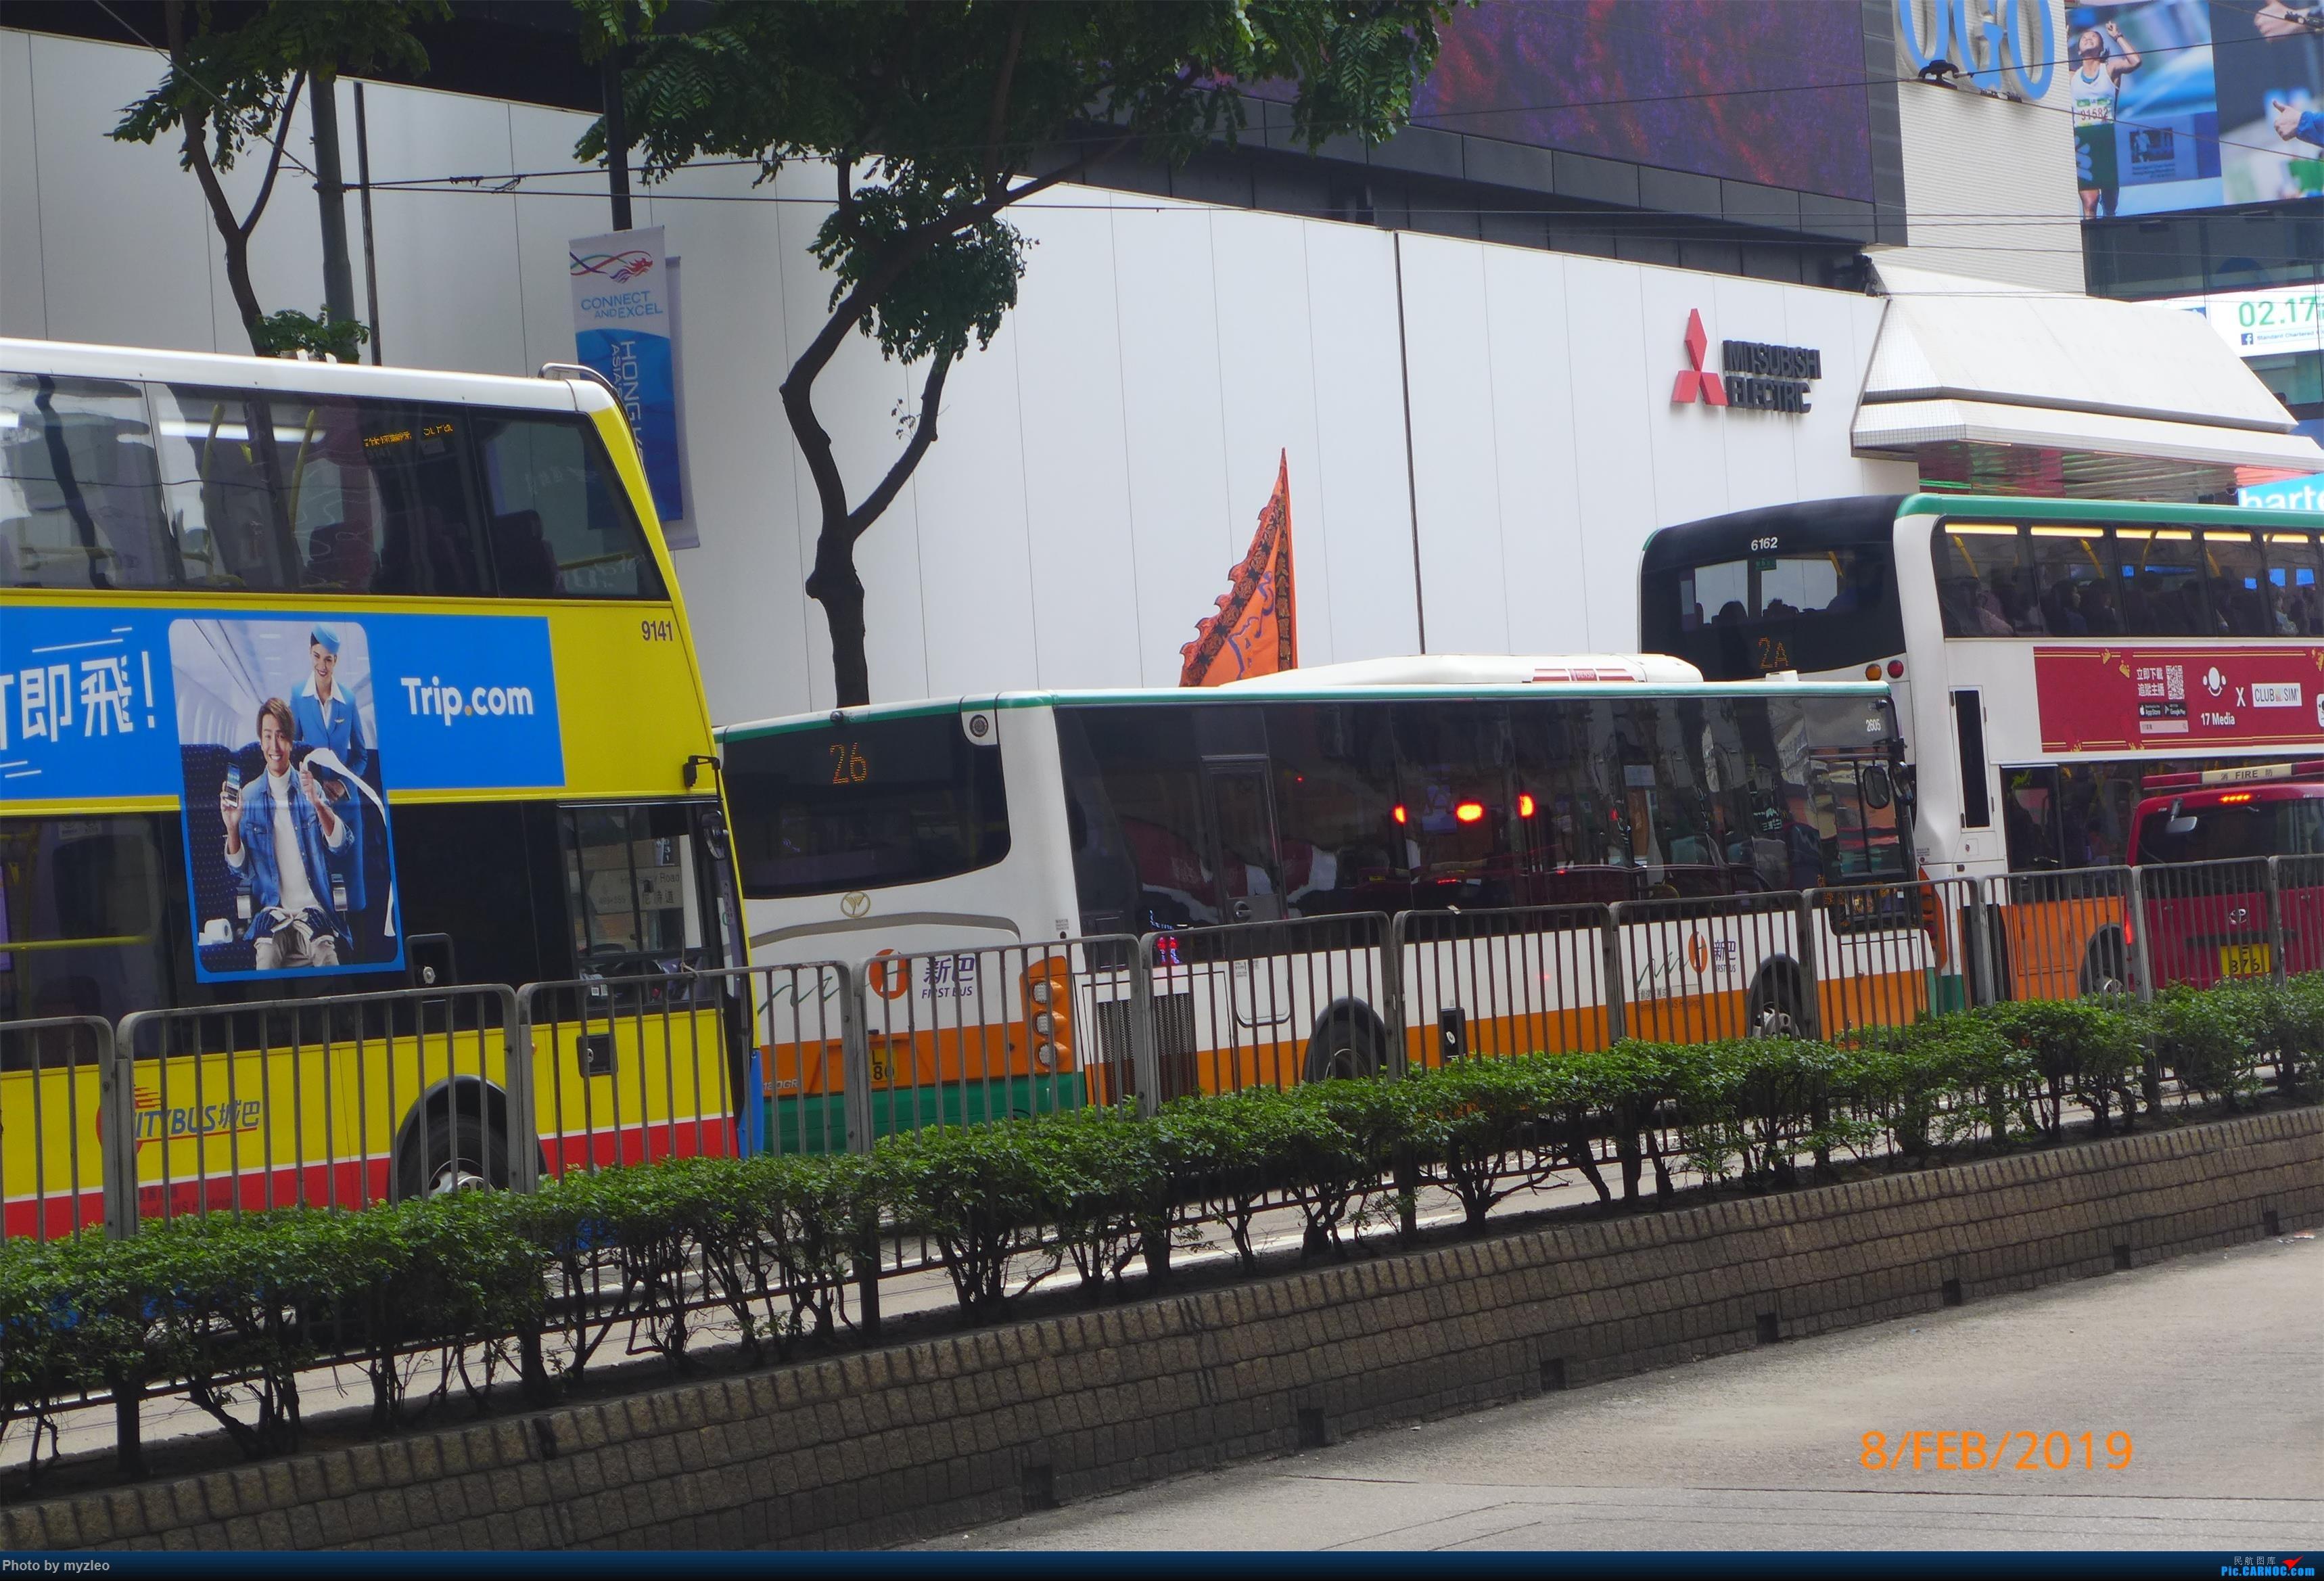 Re:[原创]【myzleo的游记4.5】十年之约(5)在香港的最后一天,搭乘港航333回沪